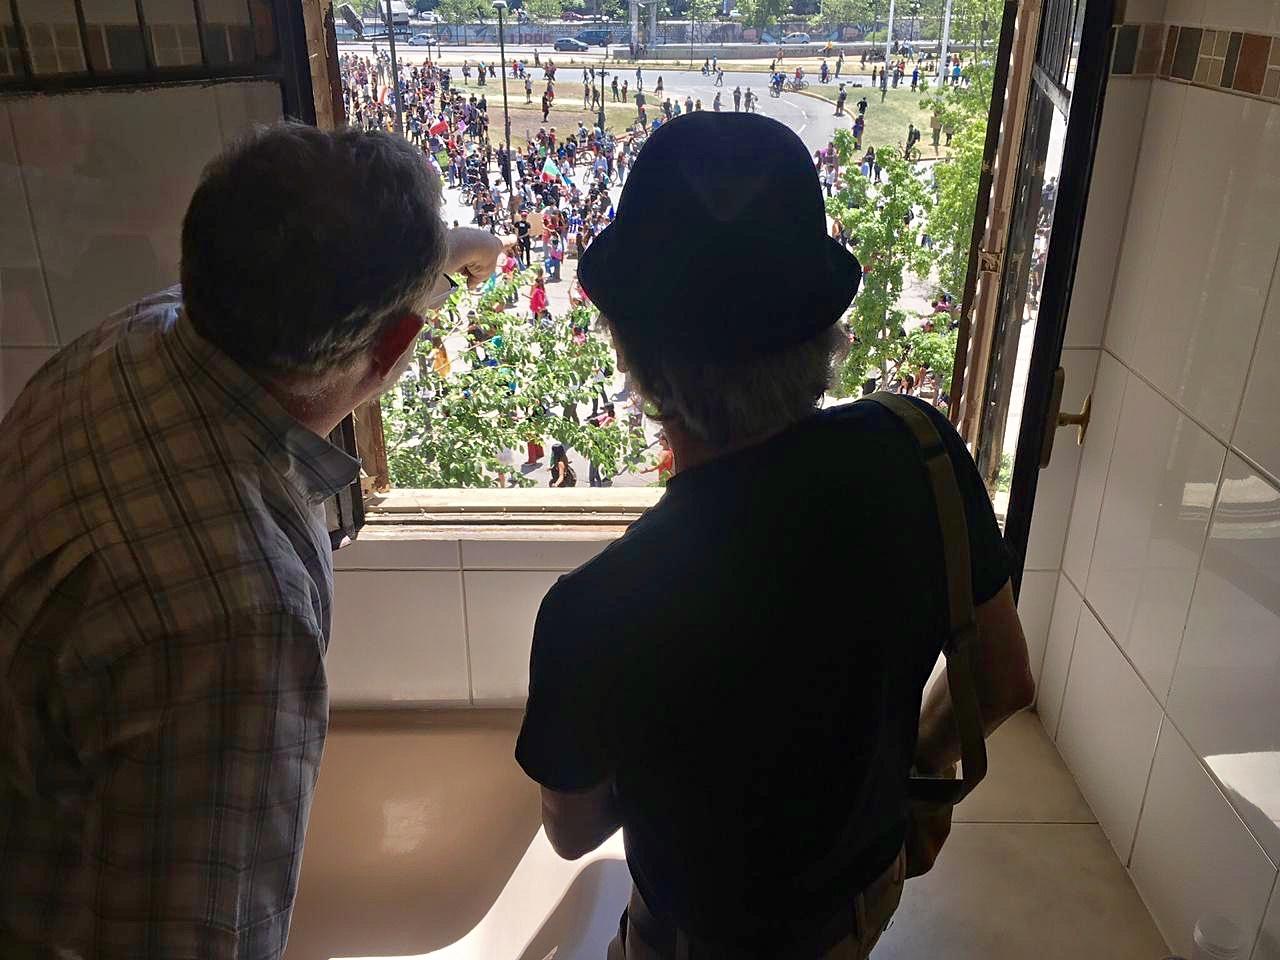 Roberto Herrscher y Joe Sacco observando a la multitud congregada en Plaza Italia. Foto: Roberto Herrscher